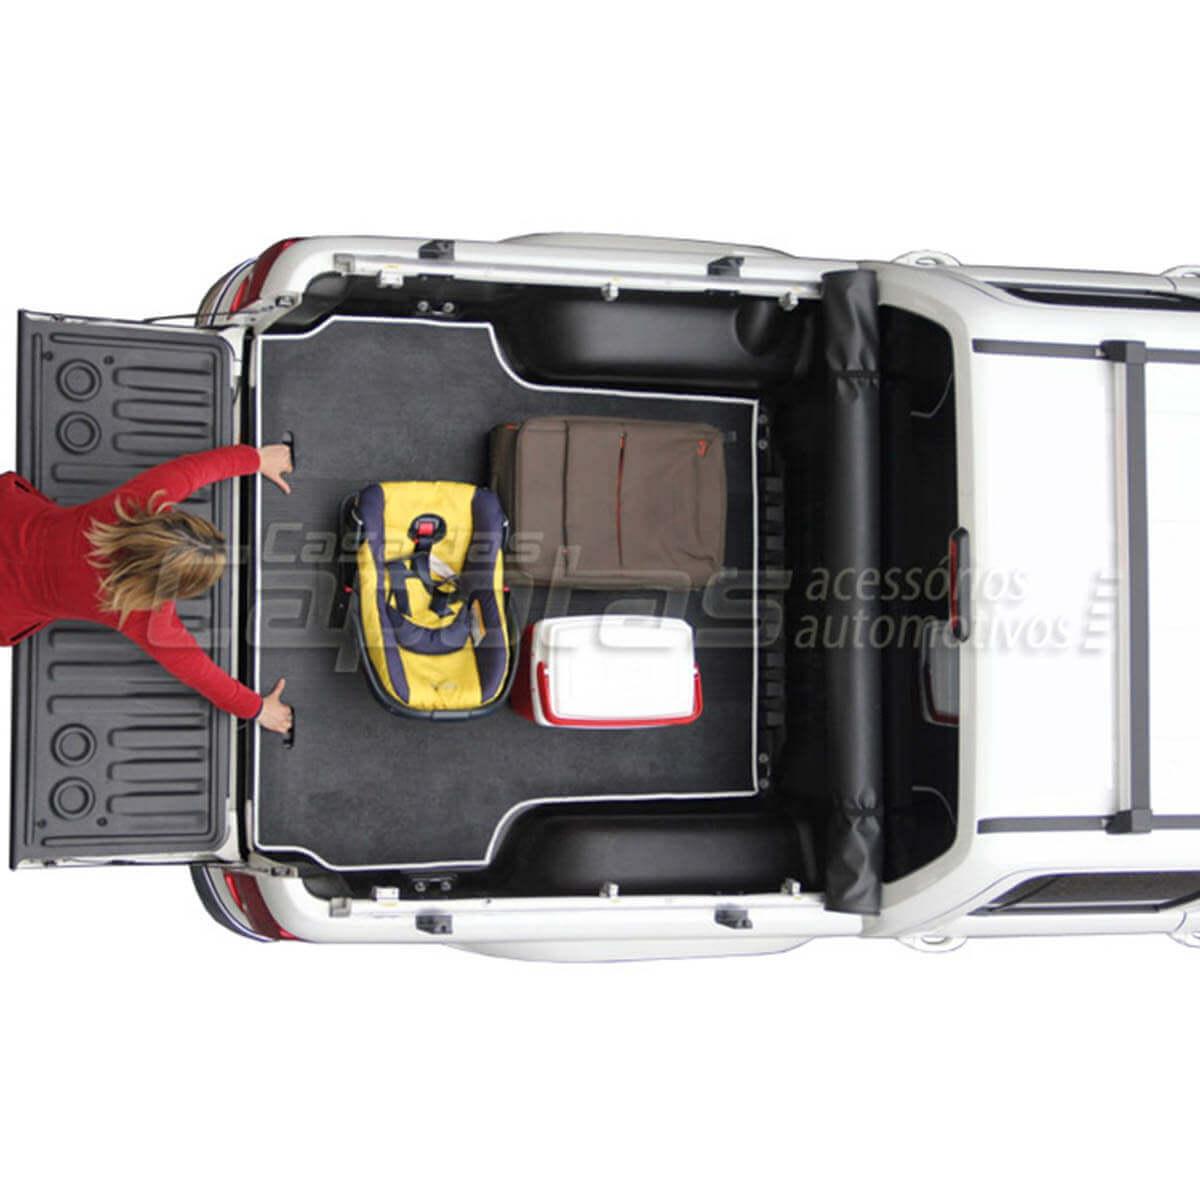 Tapete caçamba borracha L200 Triton 2008 a 2016 HPE HLS Outdoor AT Diesel Outdoor FLEX